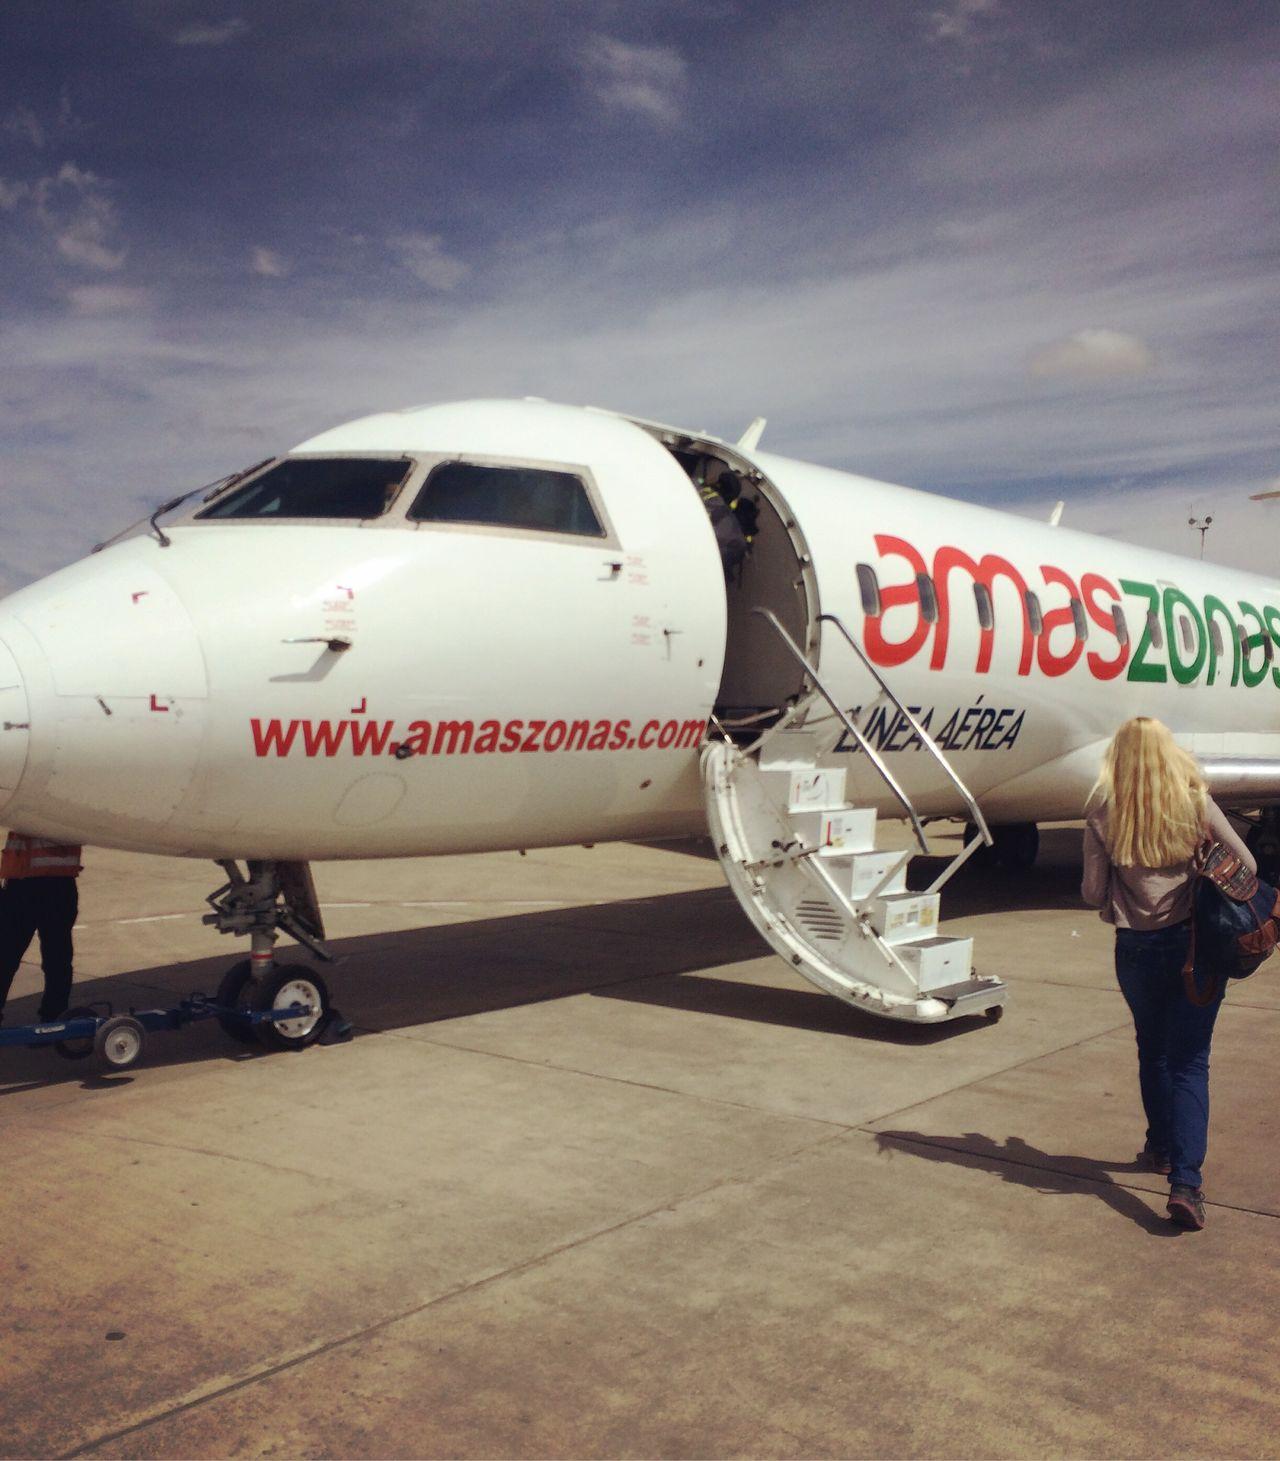 Bolivia/Lapaz Bolivia Lapaz Airport Travel Trip Airplane ボリビア ラパス 旅 旅行 海外 海外旅行 飛行機